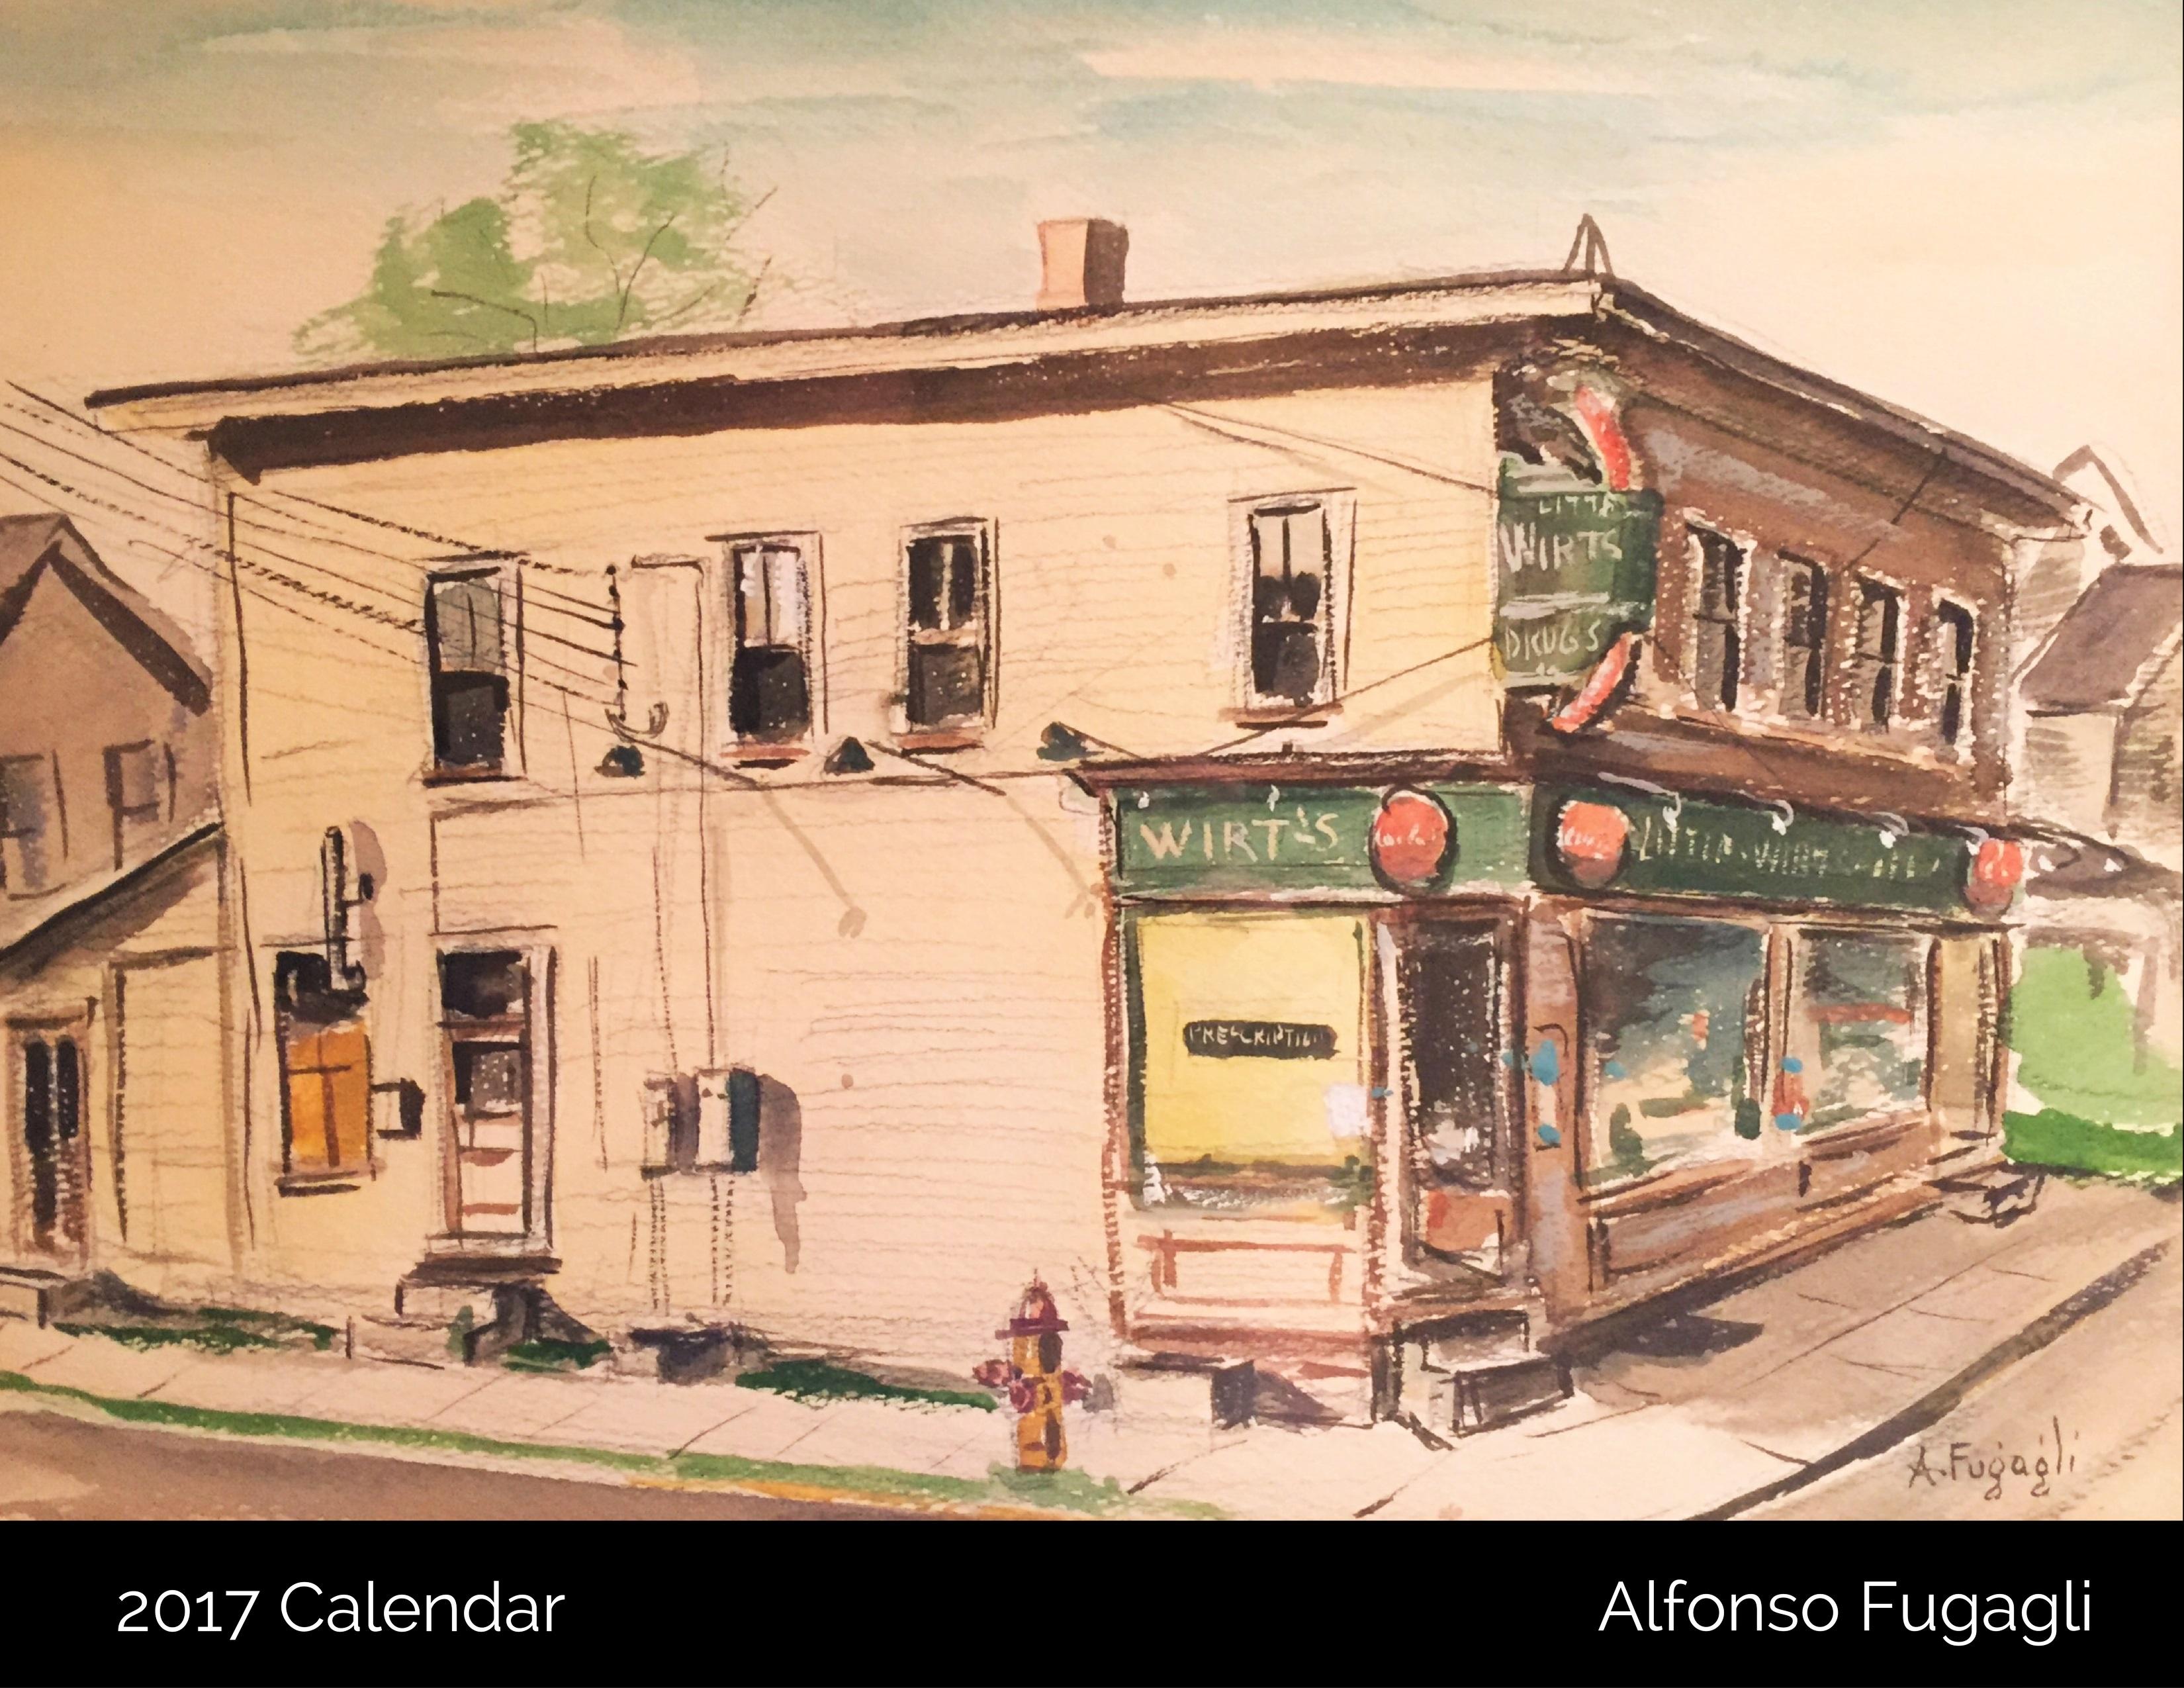 calendar-front-cover-2017-alfonso-fugagli-2